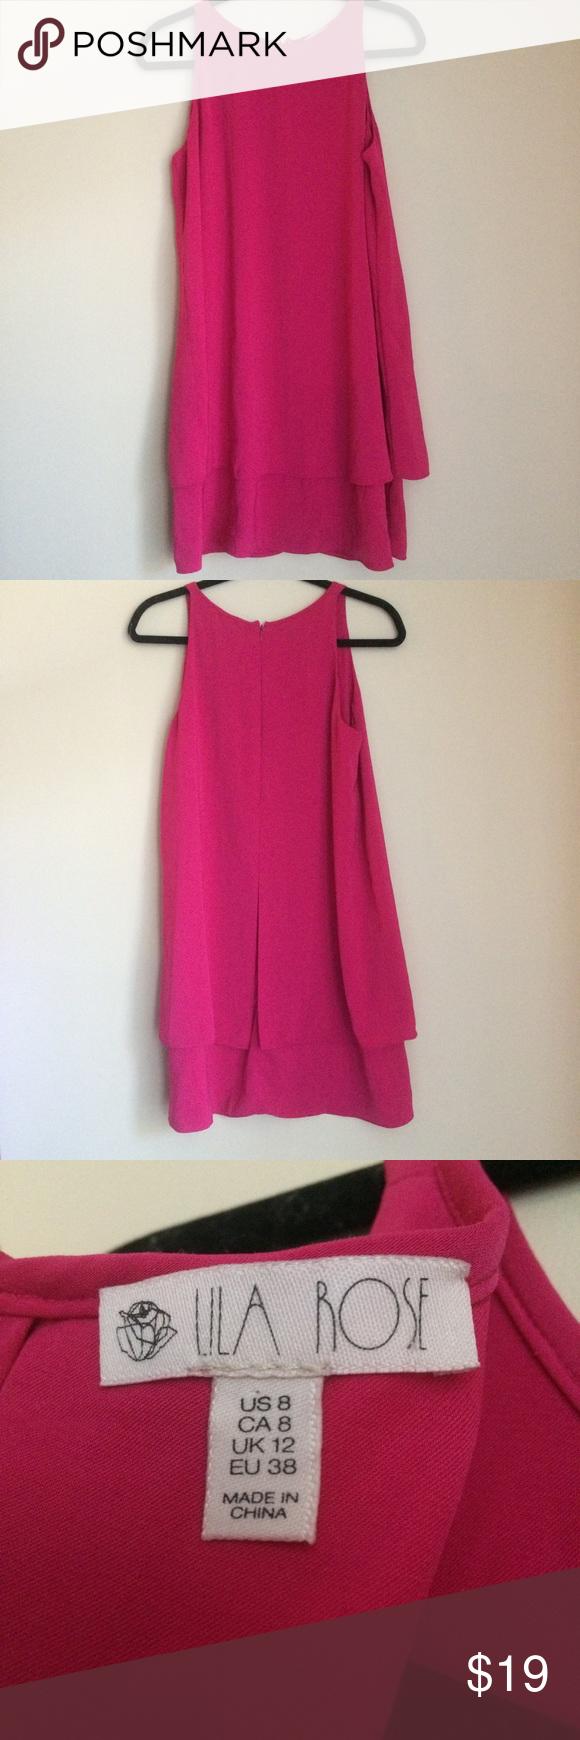 Bright pink dress for wedding guest  Lila Rose Bright Pink Layered Sleeveless Dress  My Posh Picks